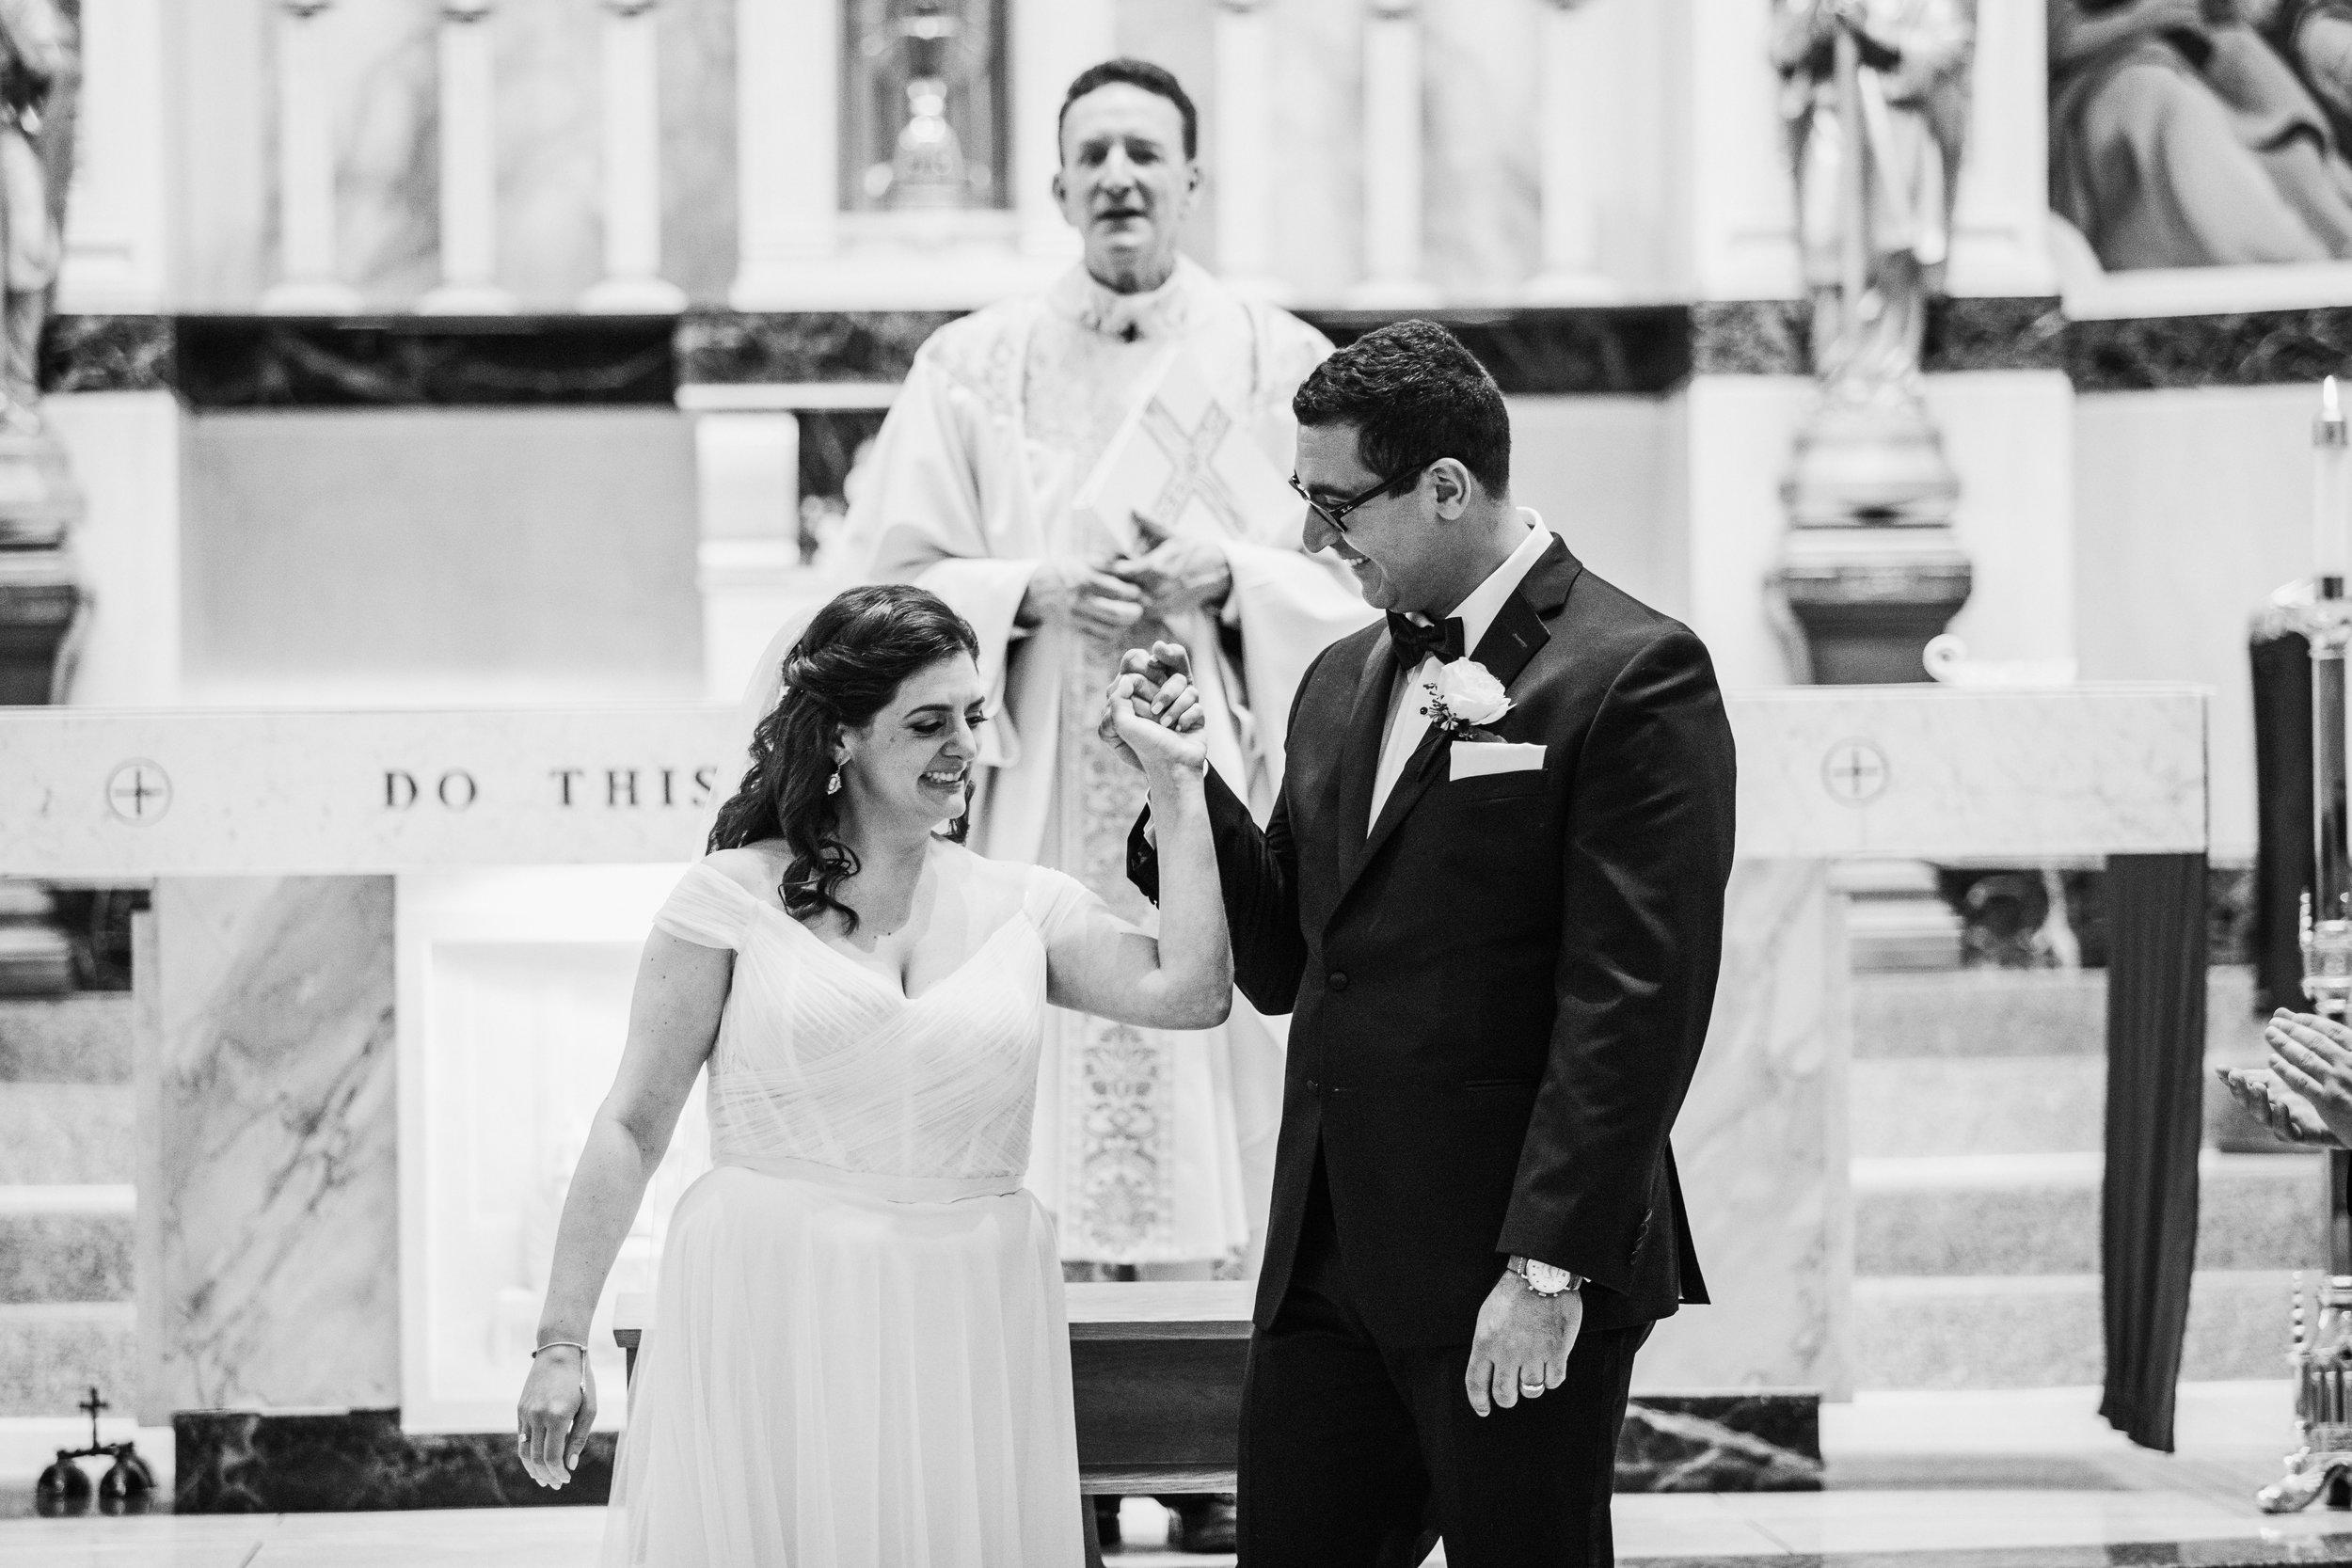 JennaLynnPhotography-NJWeddingPhotographer-Philadelphia-Wedding-ArtsBallroom-CeremonyBW-63.jpg